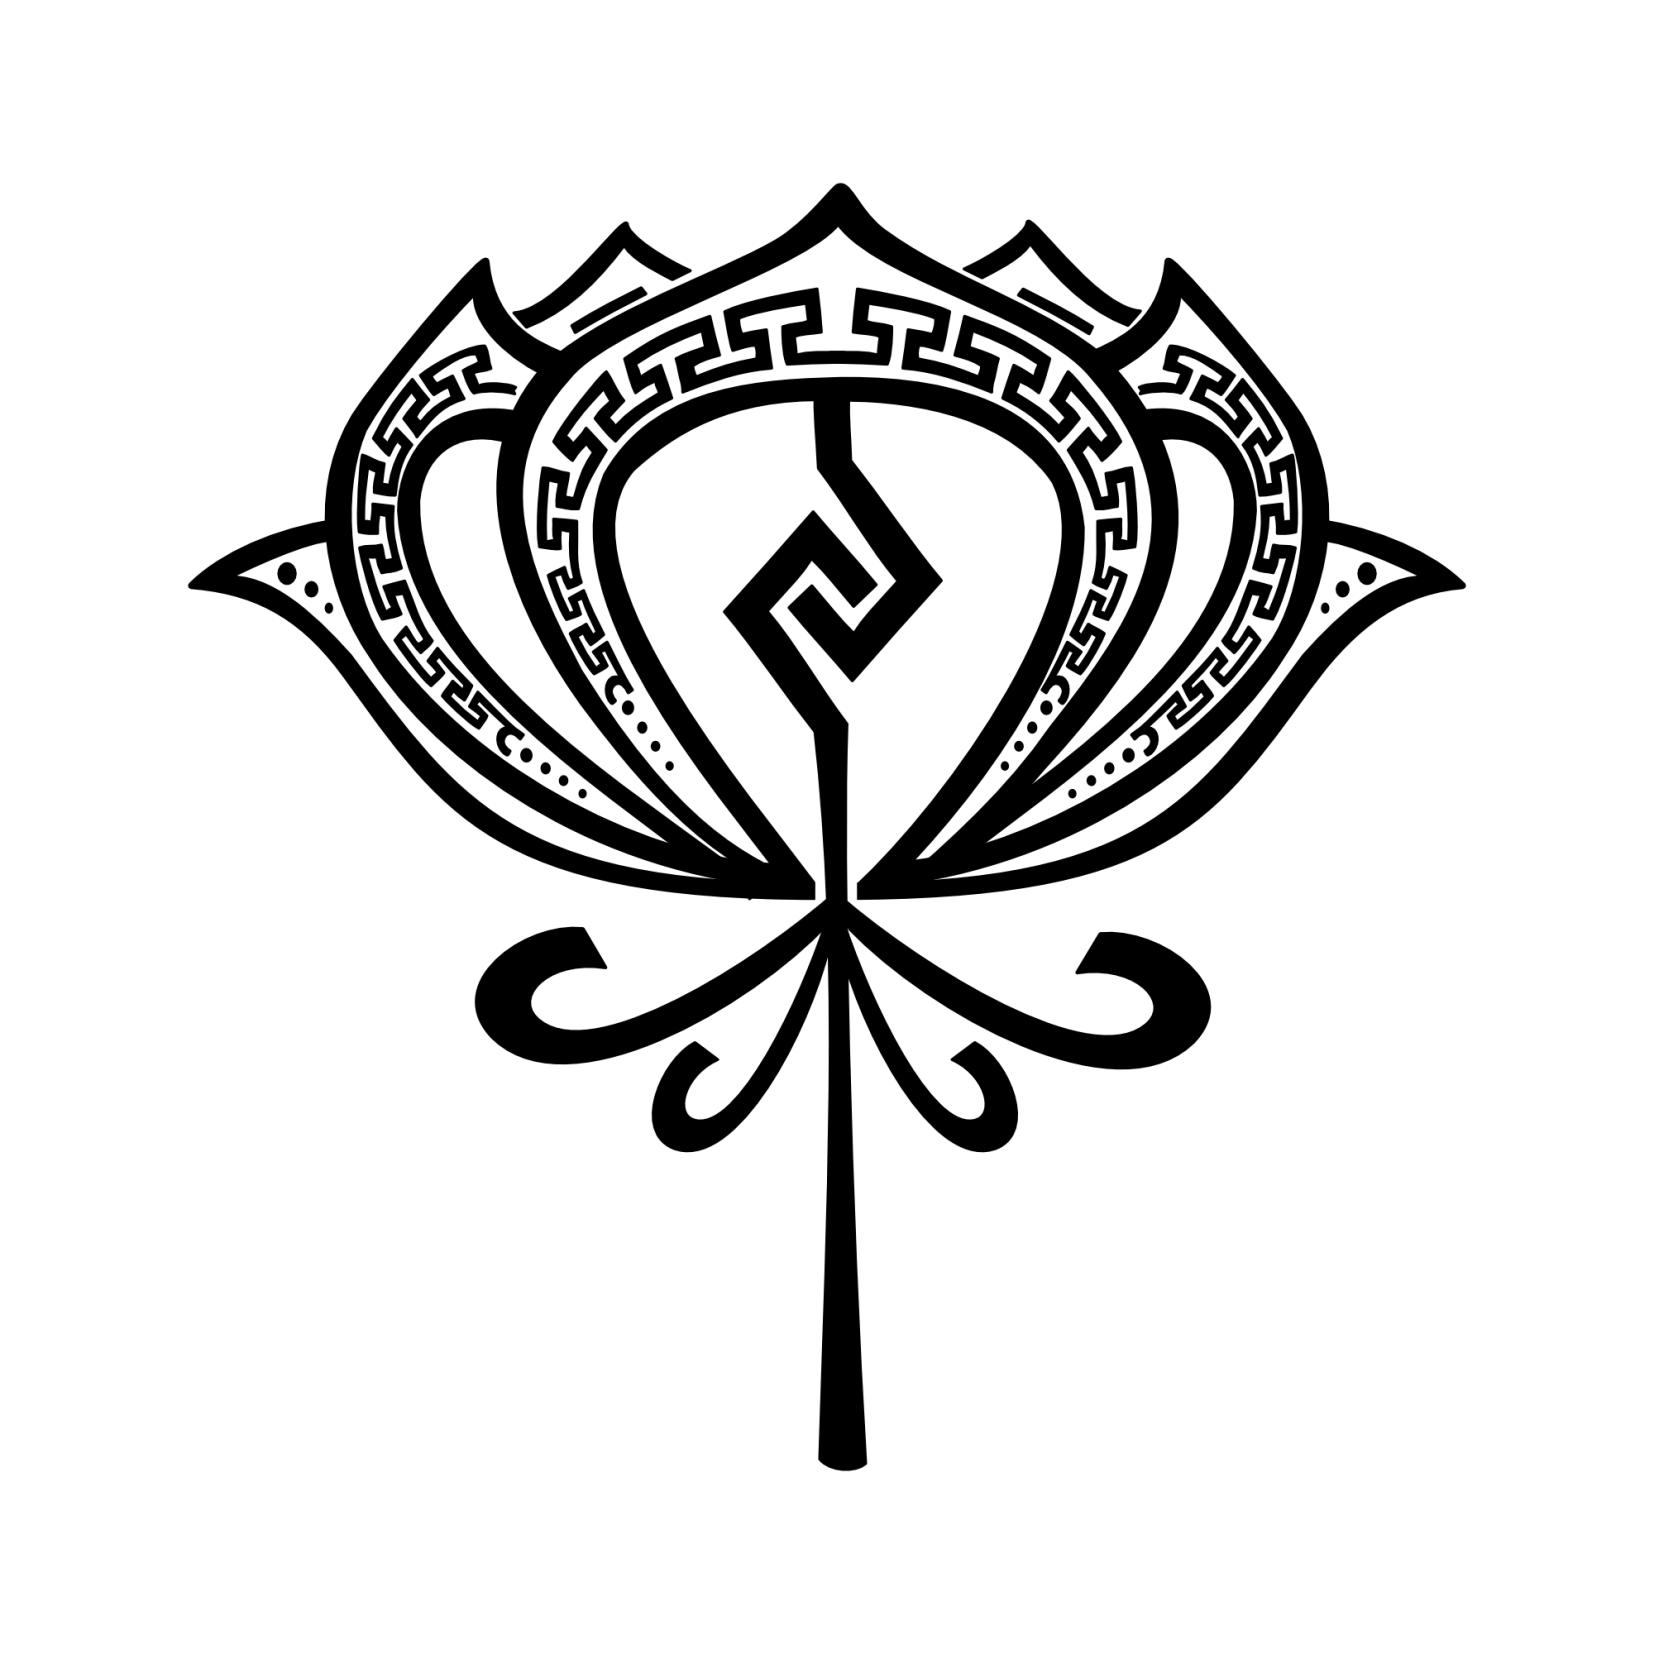 Aztec symbols tatuaggio di loto aztecoperfezione unione tattoo aztec symbols tatuaggio di loto aztecoperfezione unione tattoo tattootribes biocorpaavc